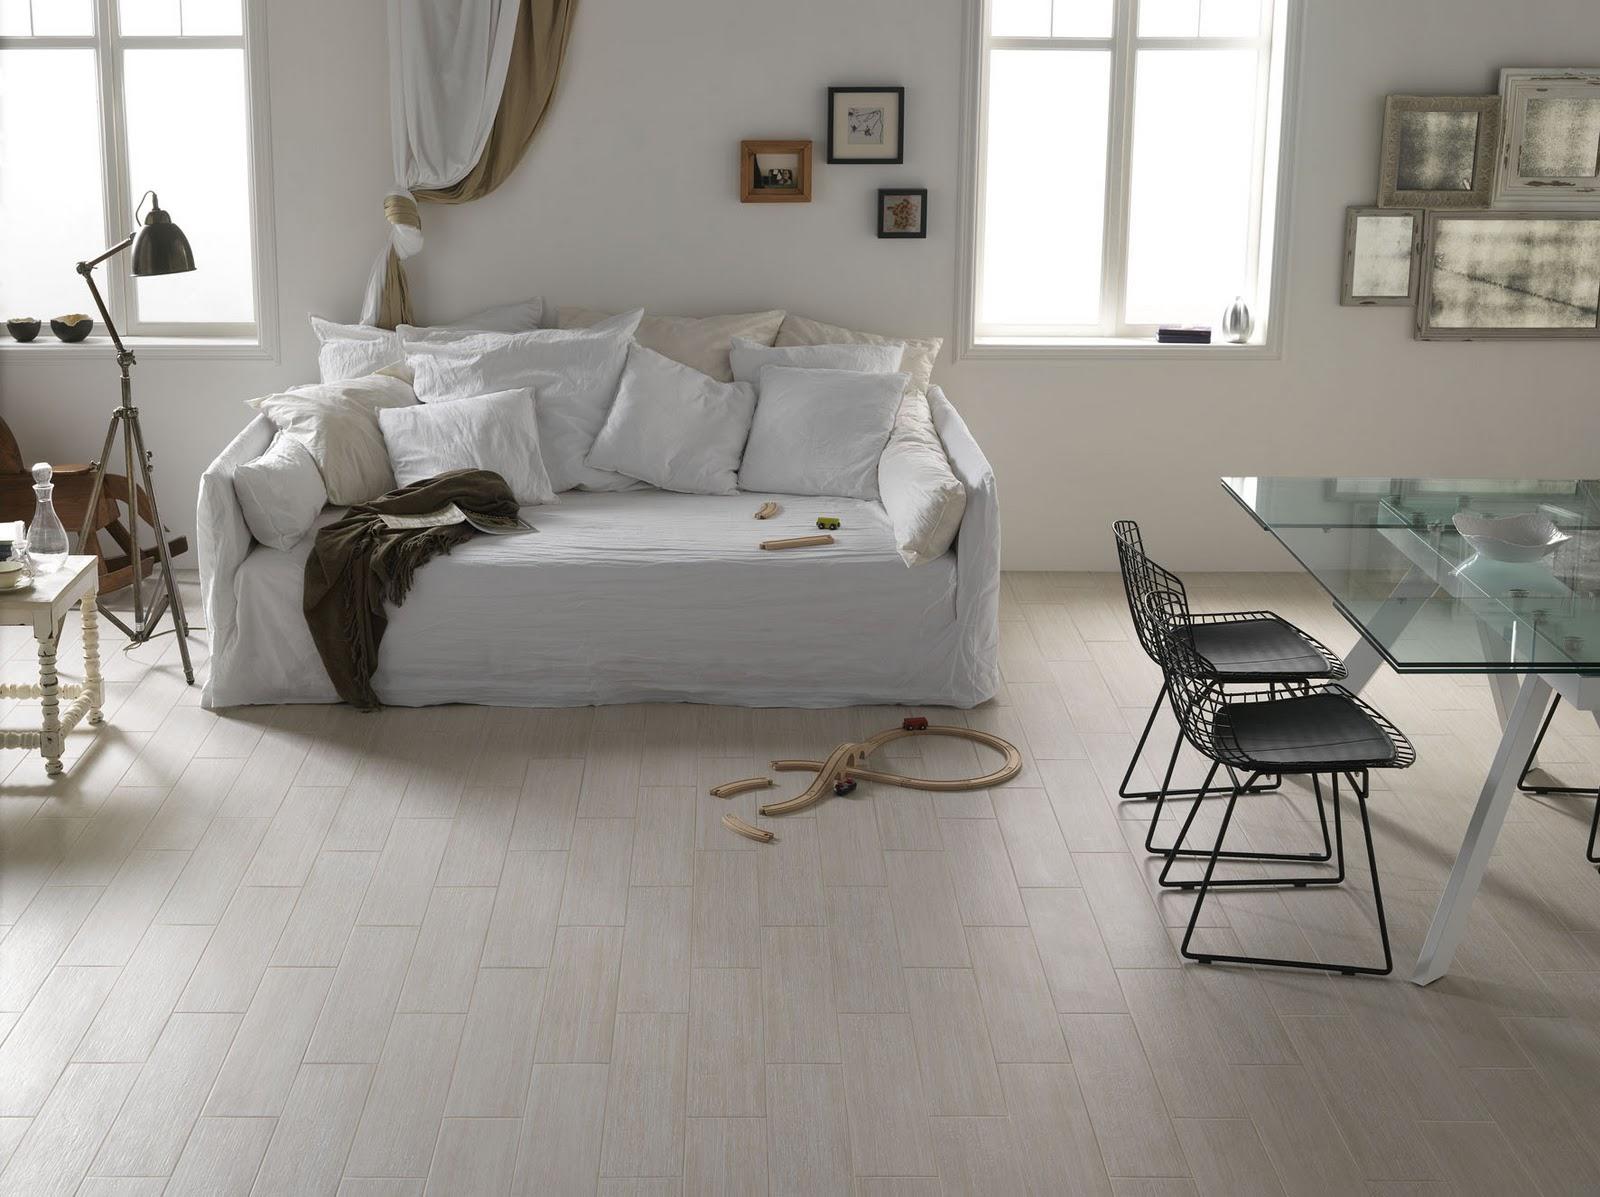 Arredo pavimento design living e bagno ImolaCeramica